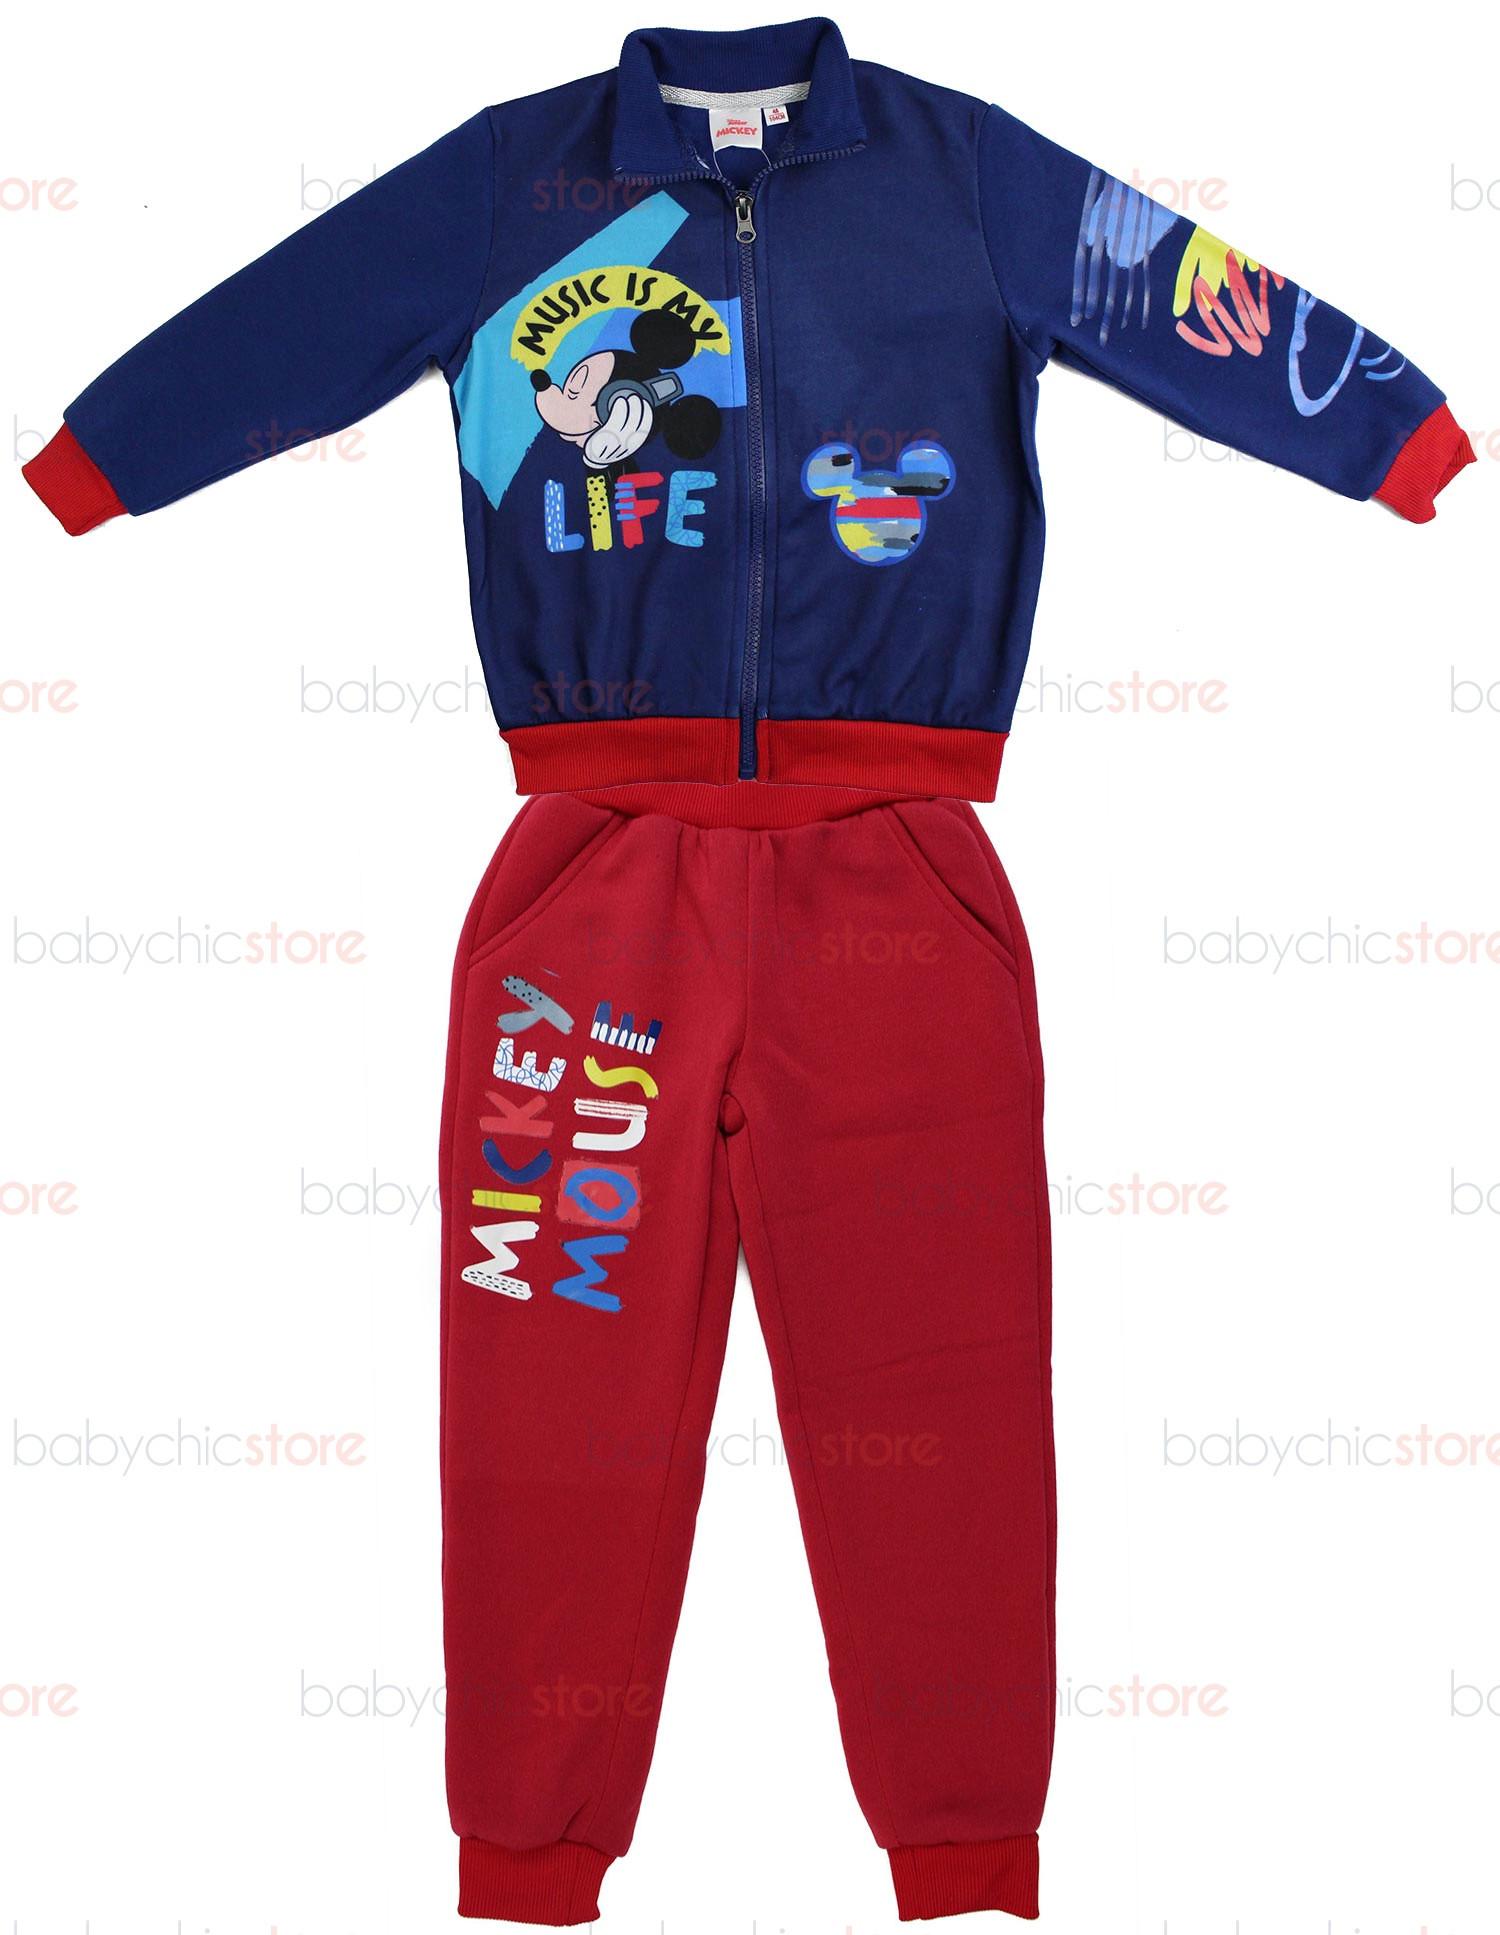 Jogging Set Mickey Mouse - Rosso/Blu - 8 Anni